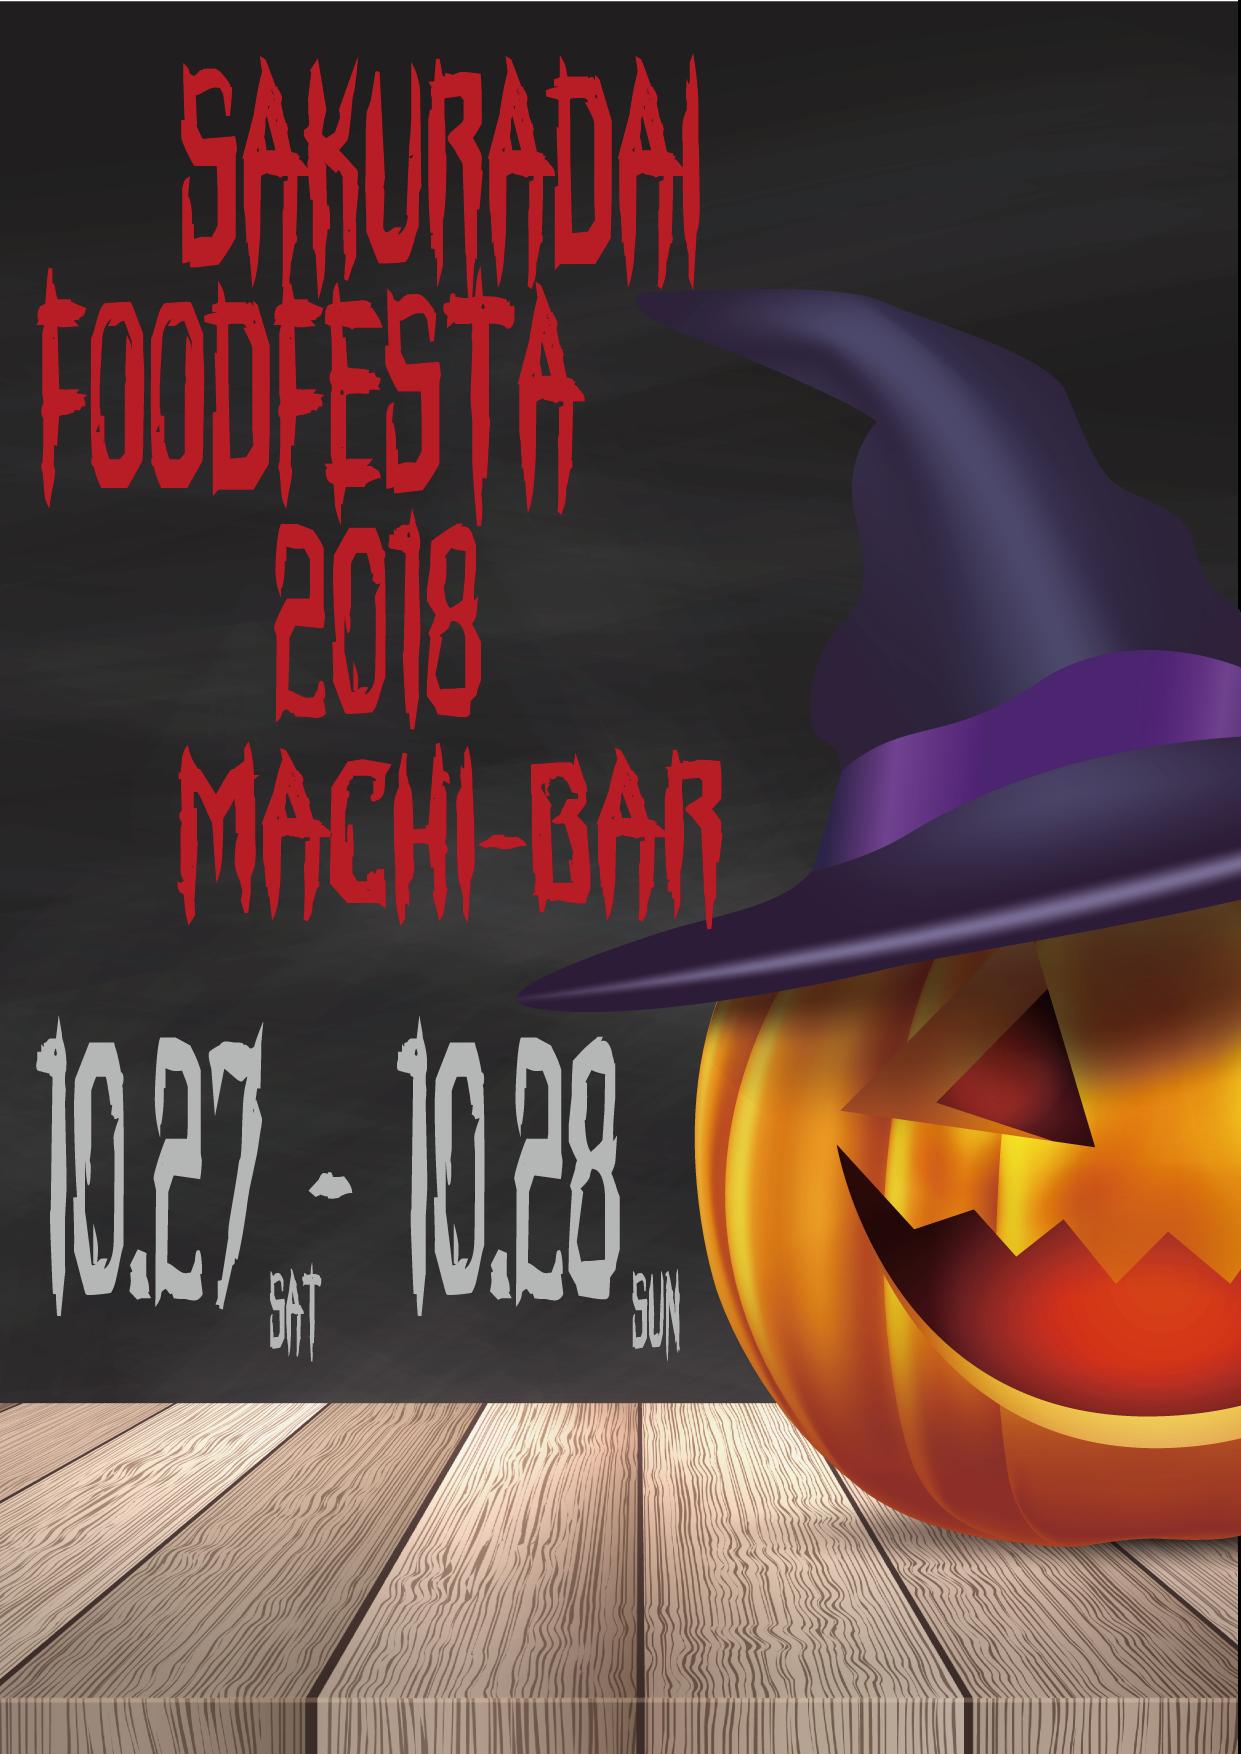 Sakuradai foods Festa 2018